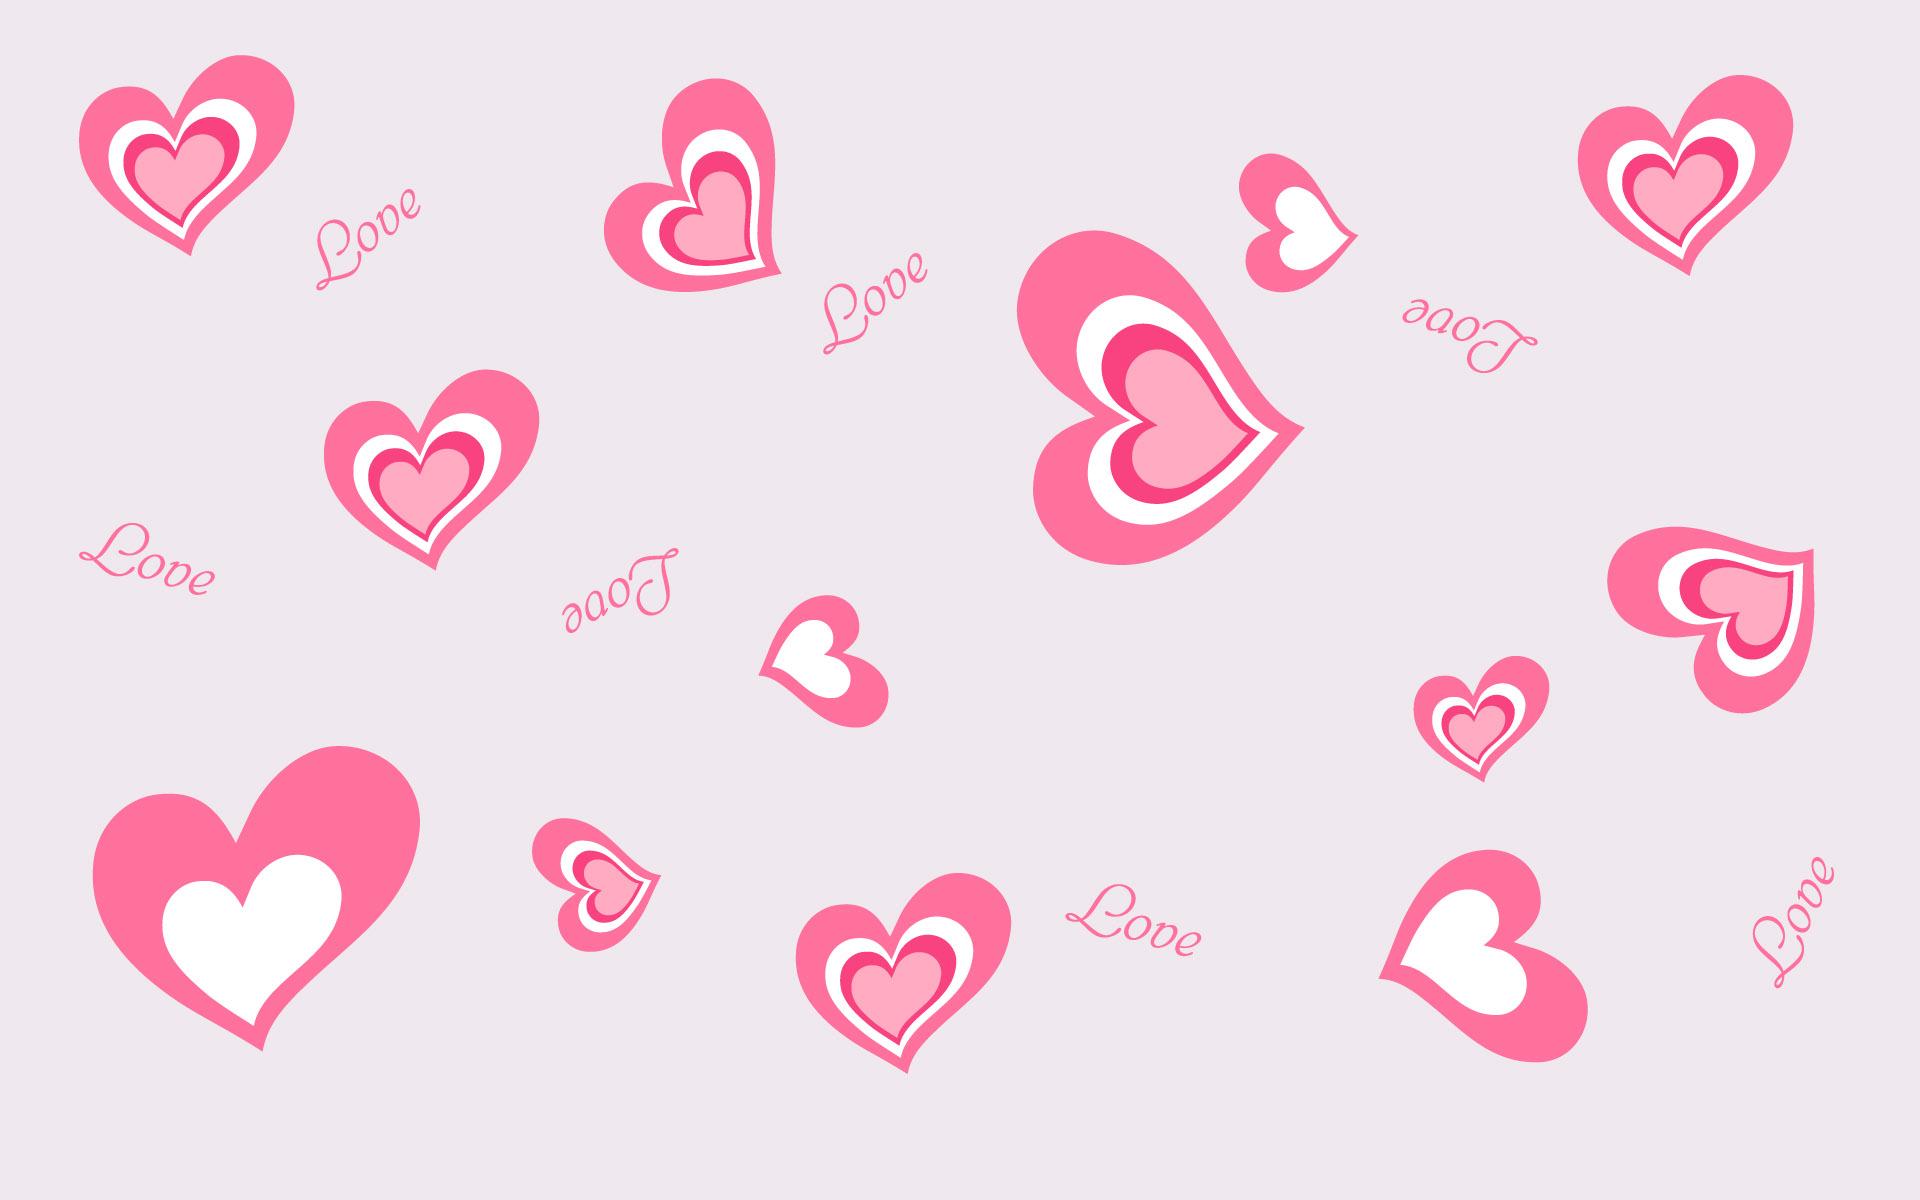 Pattern Love Heart Valentine's Day Holiday Holidays 1920x1200